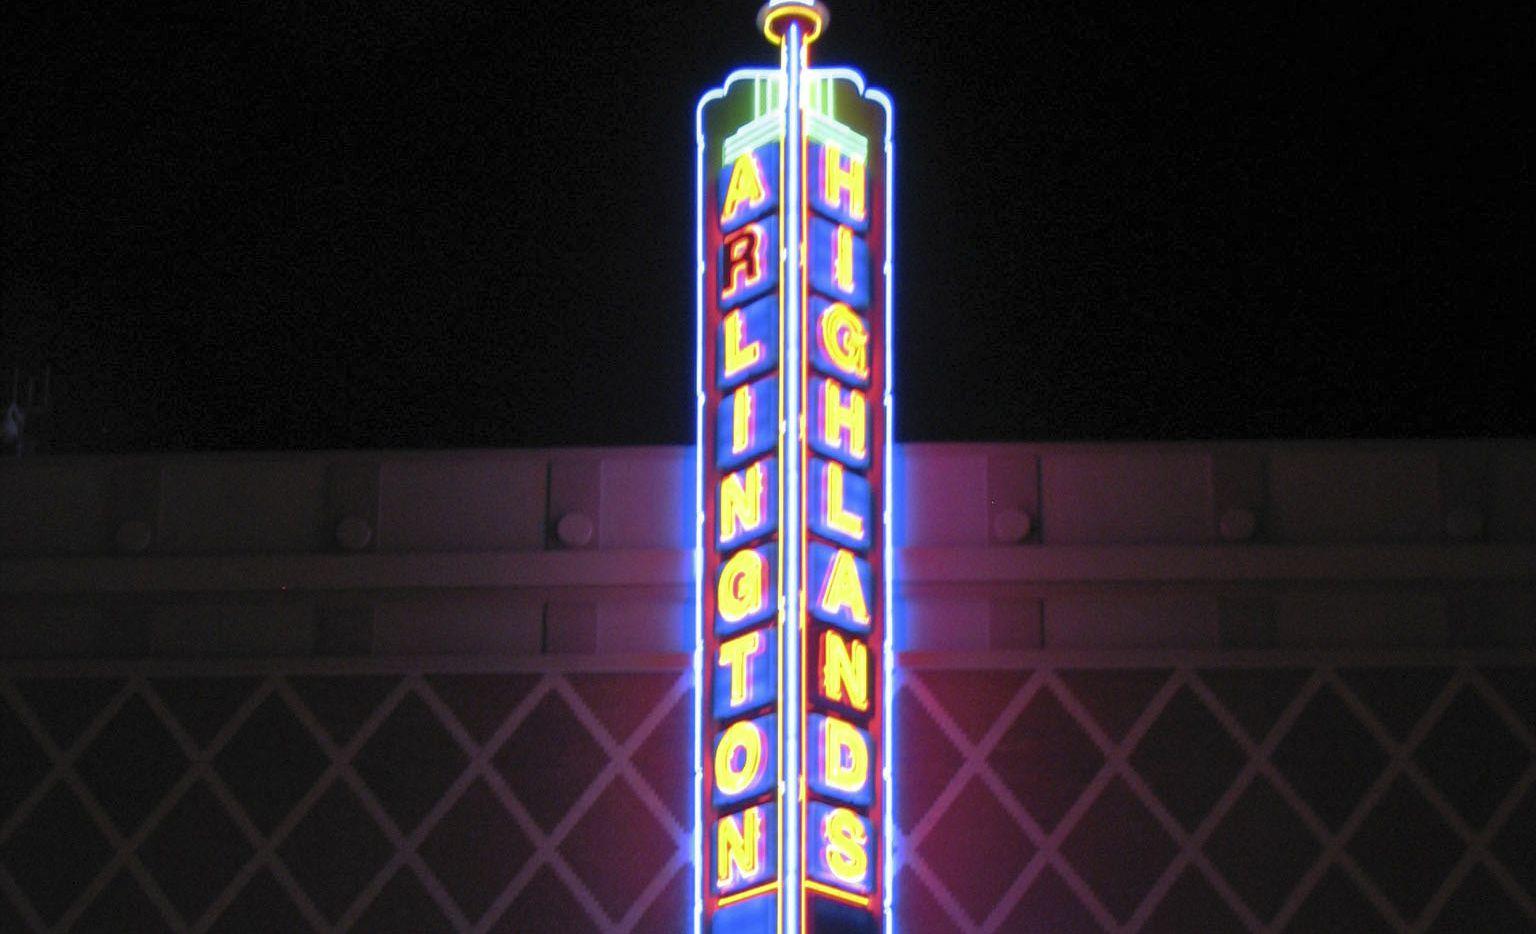 Houlihan's at Arlington Highlands in South Arlington has closed.